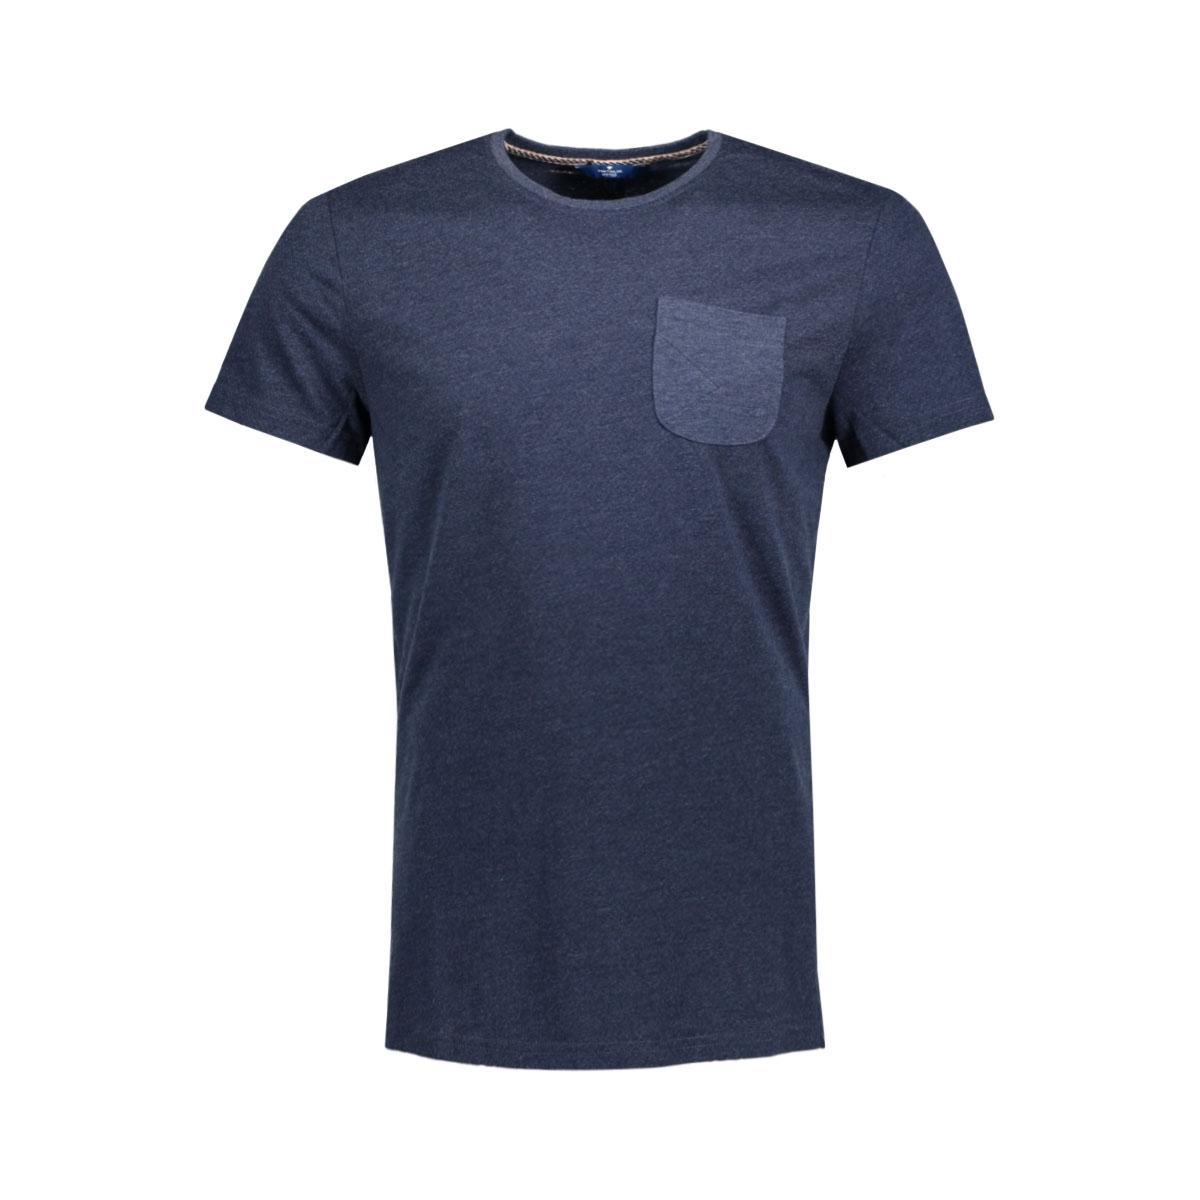 1038810.00.10 tom tailor t-shirt 6811